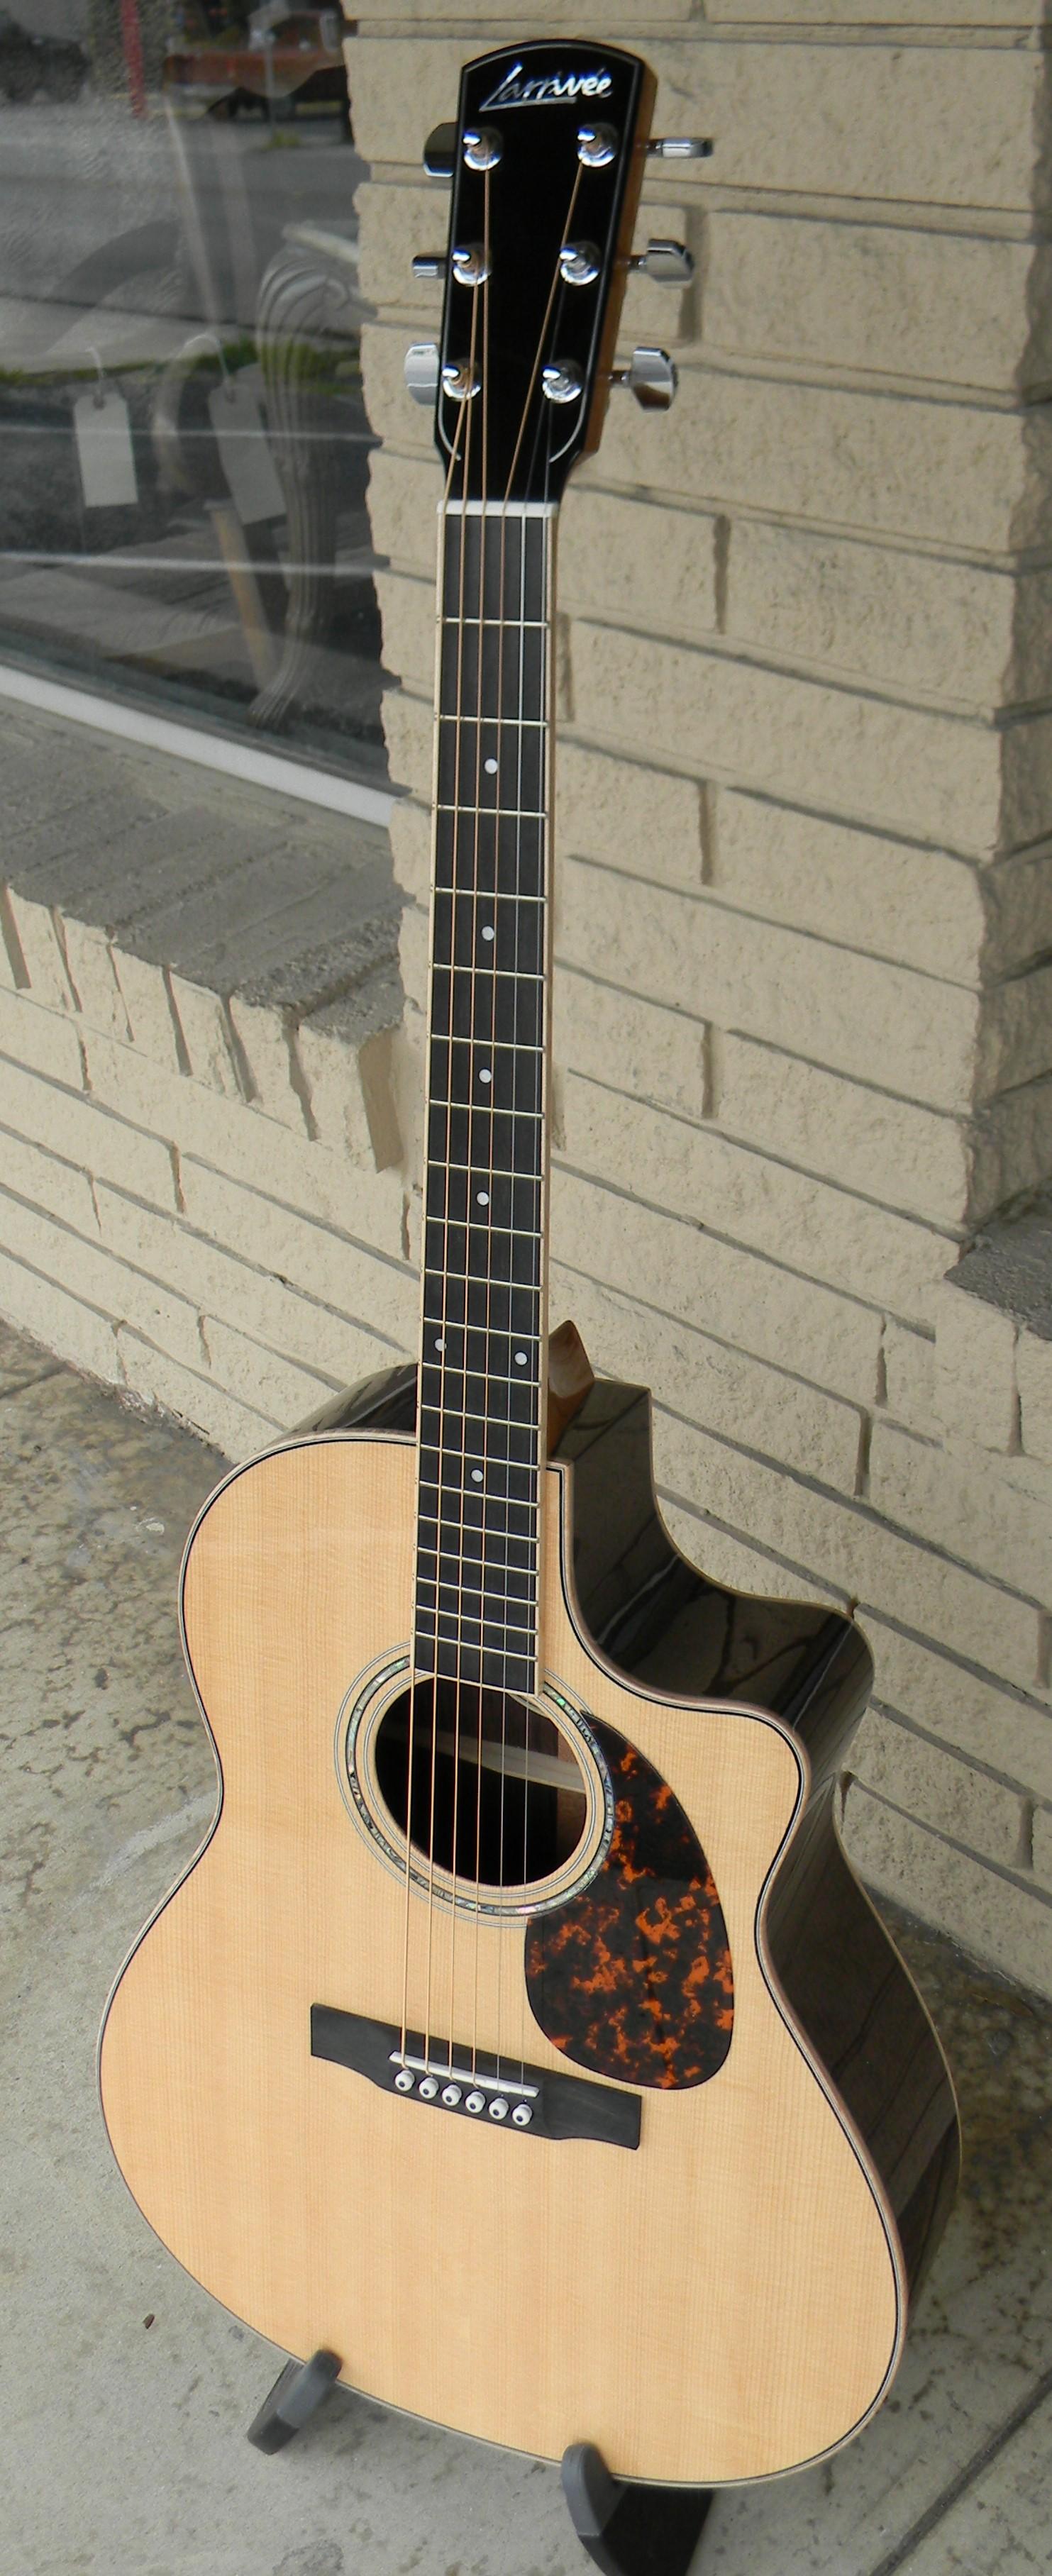 dscn2362 san antonio guitar store guitar tex. Black Bedroom Furniture Sets. Home Design Ideas